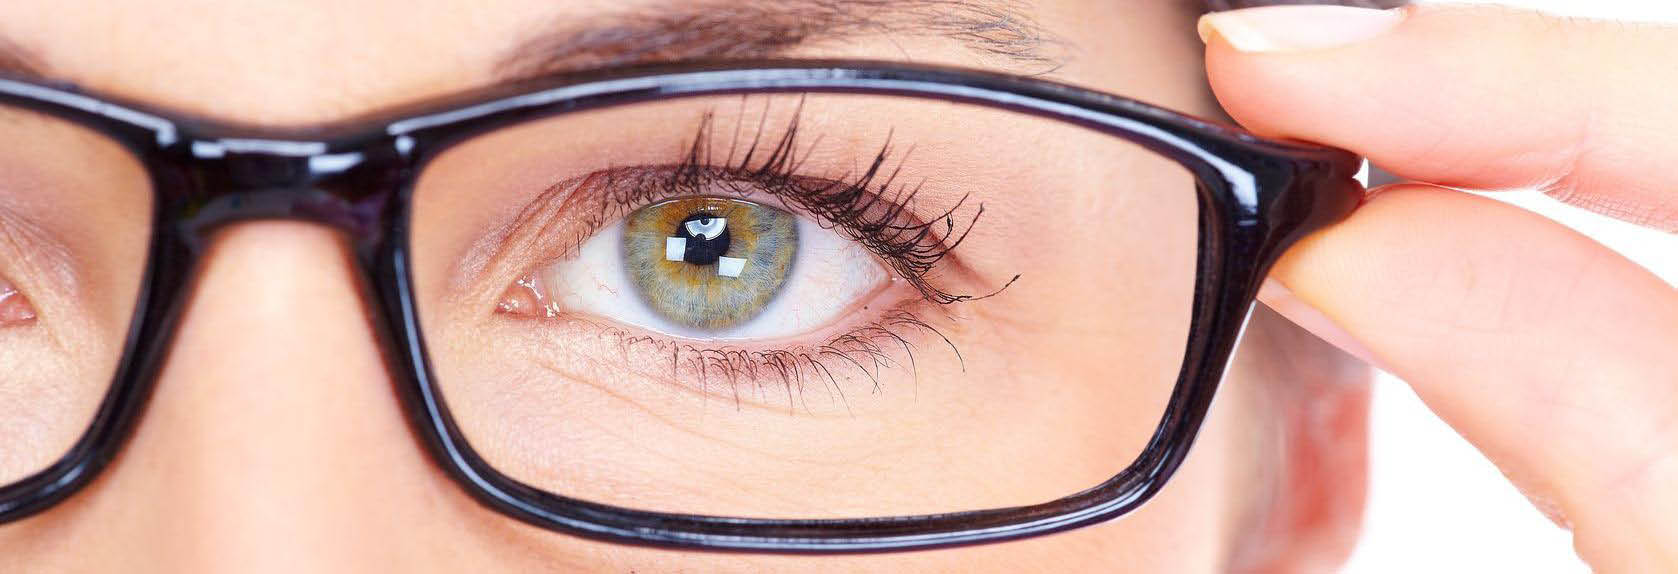 eye dr near me need eye exam need eyes checked